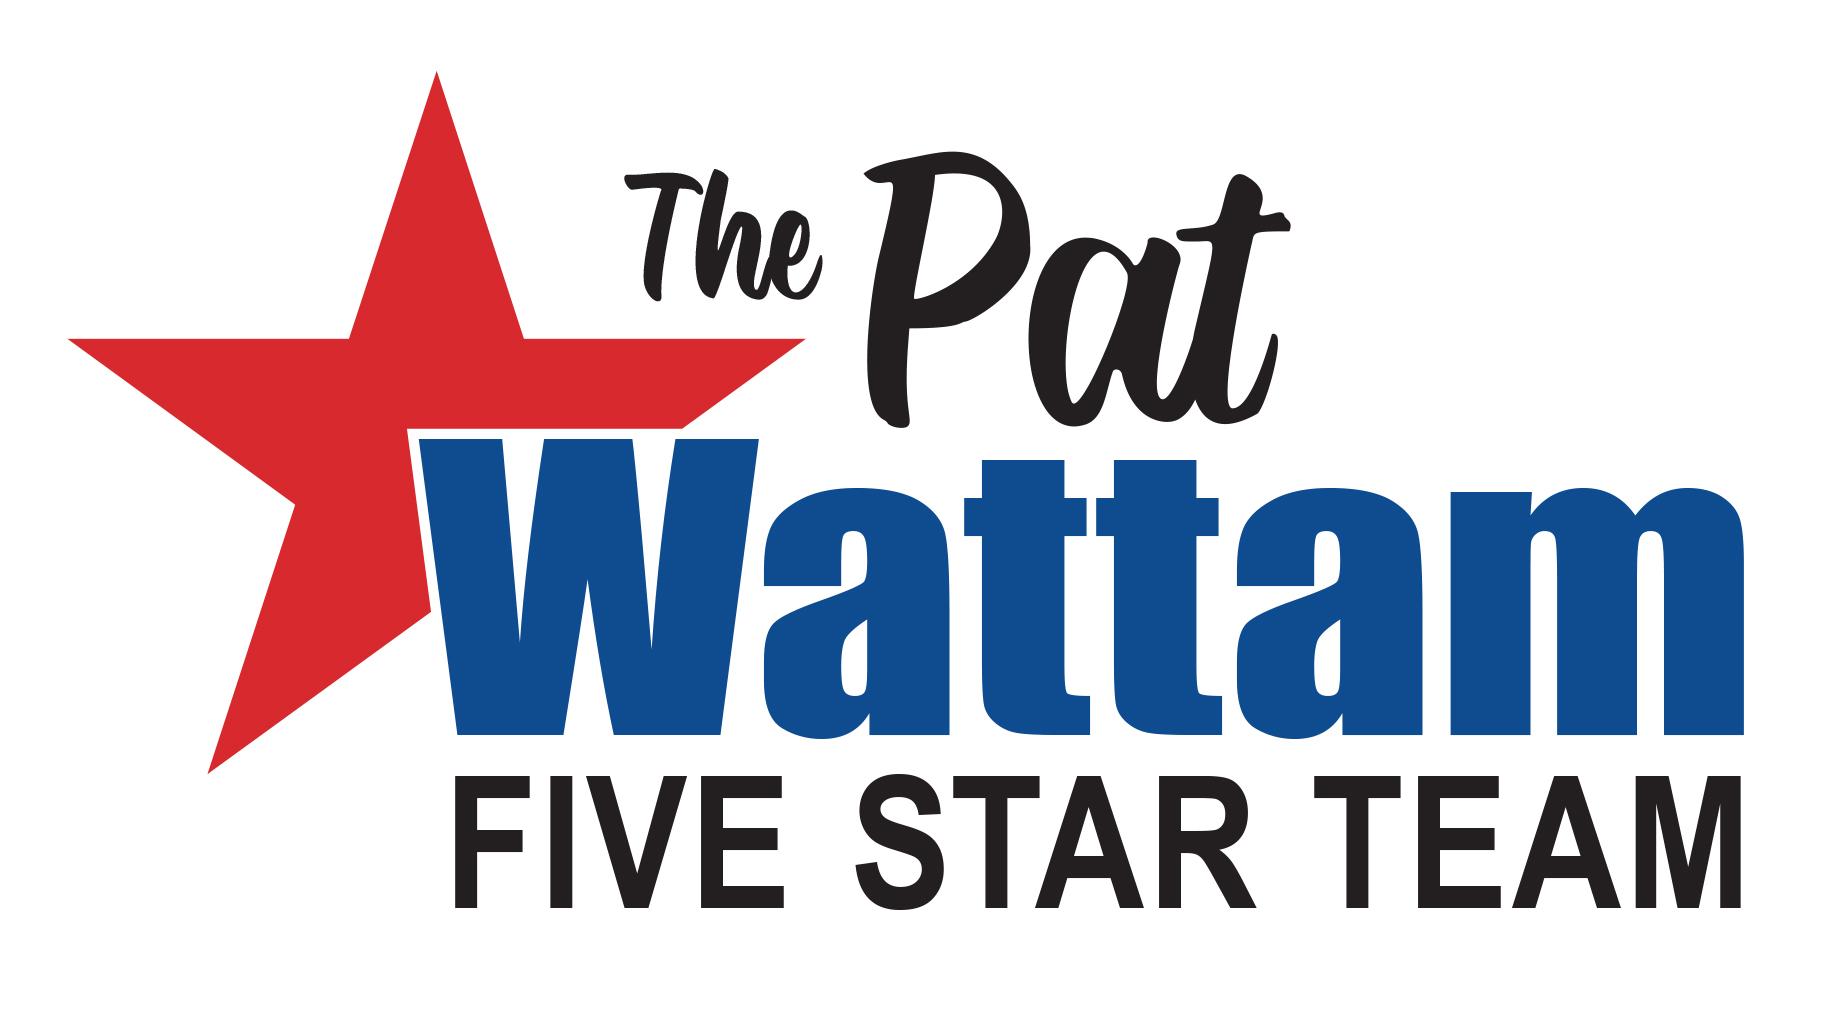 Pat Wattam Five Star Team logo